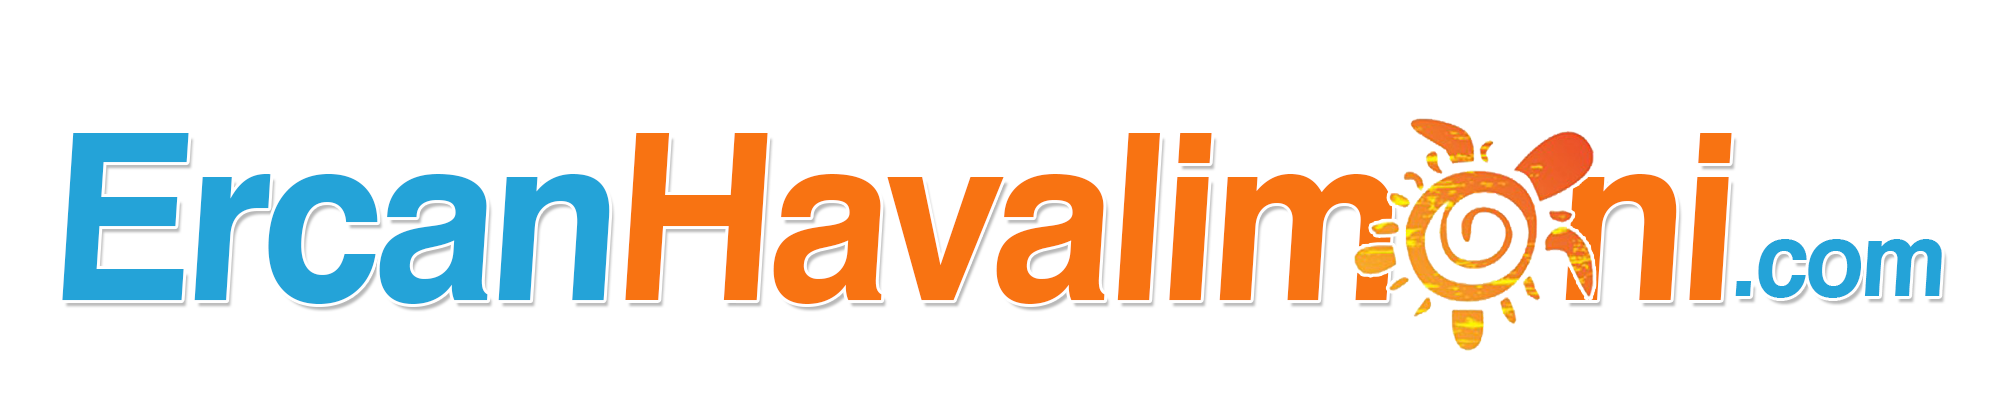 ErcanHavalimani.com